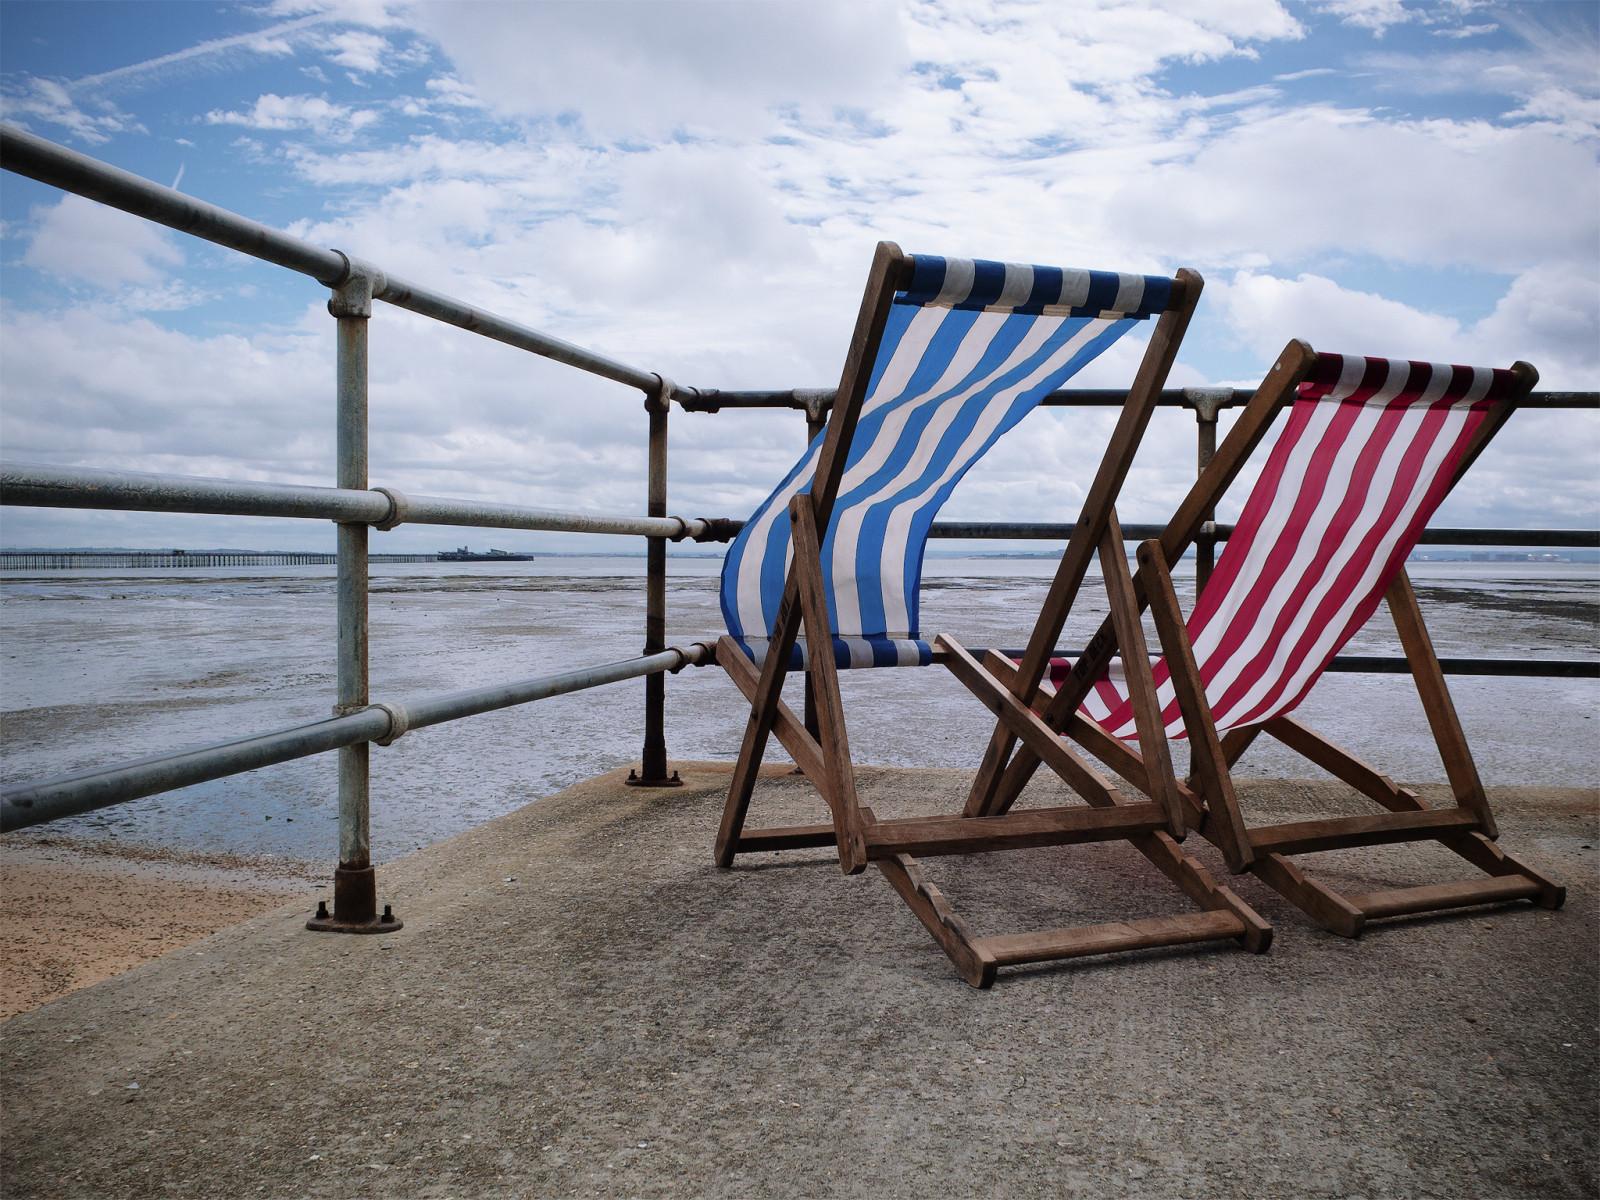 Fondos de pantalla : mar, agua, cielo, playa, madera, silla ...